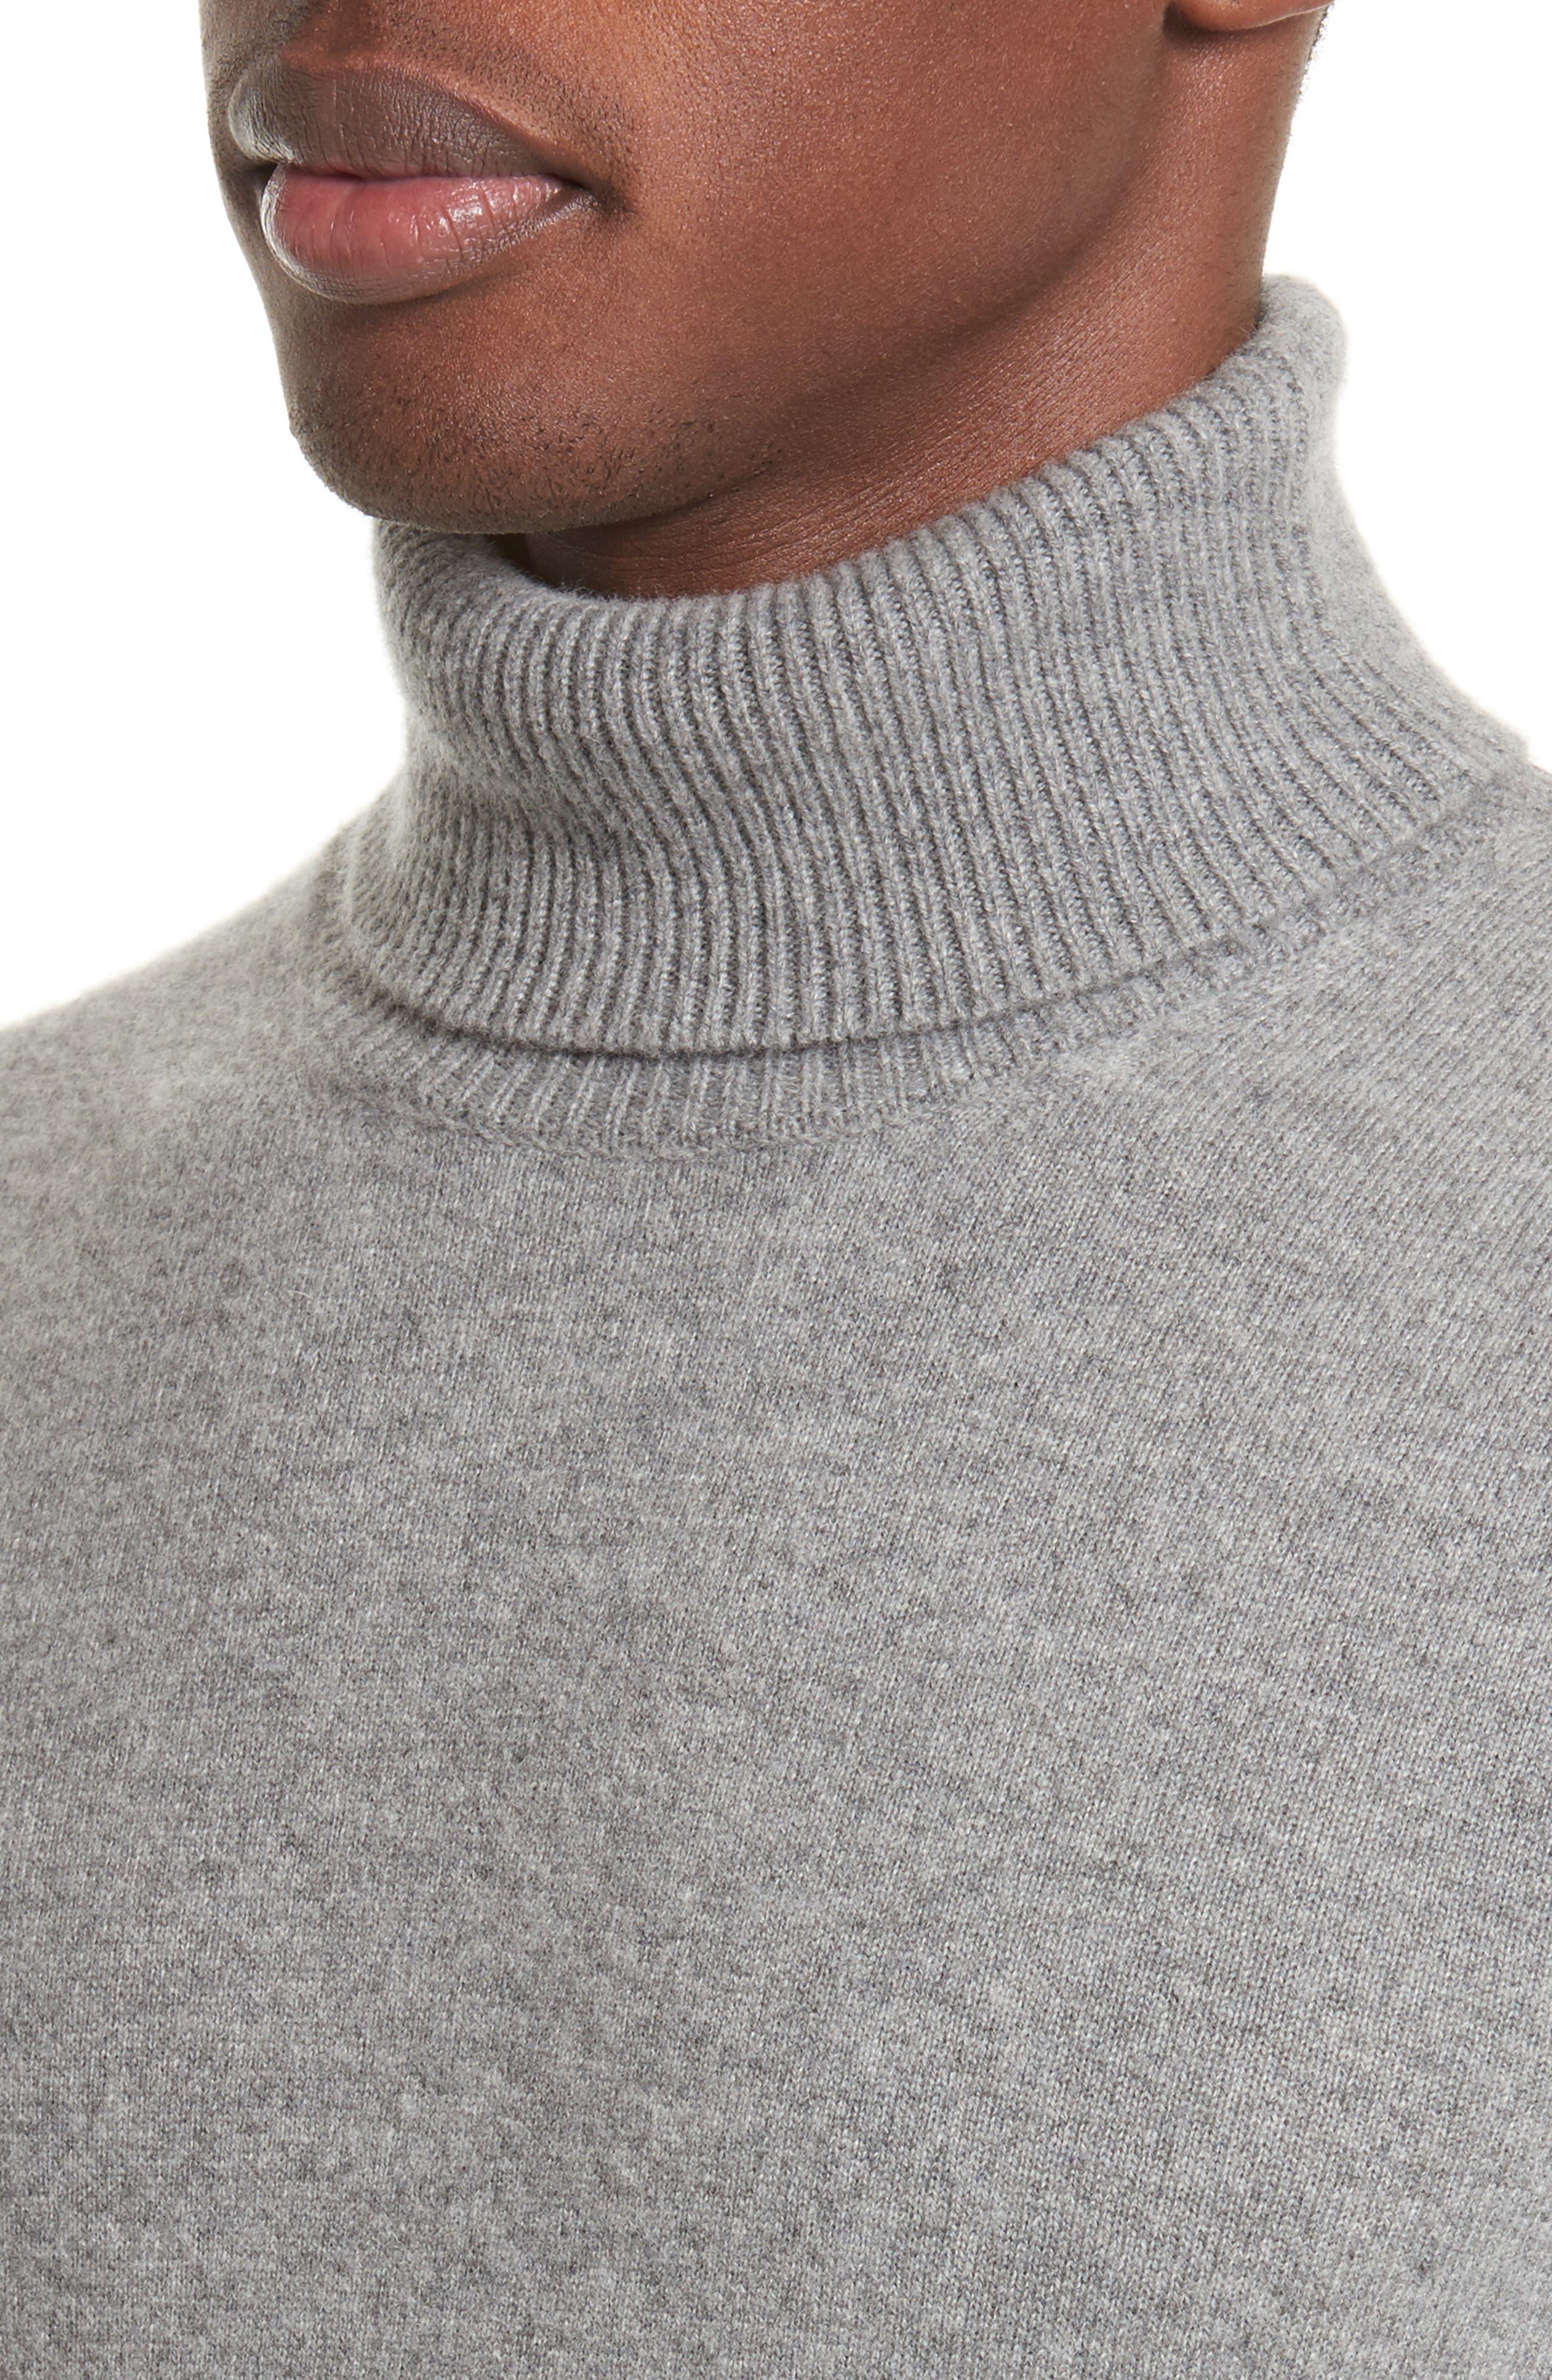 Turtleneck Sweater,                             Alternate thumbnail 4, color,                             037